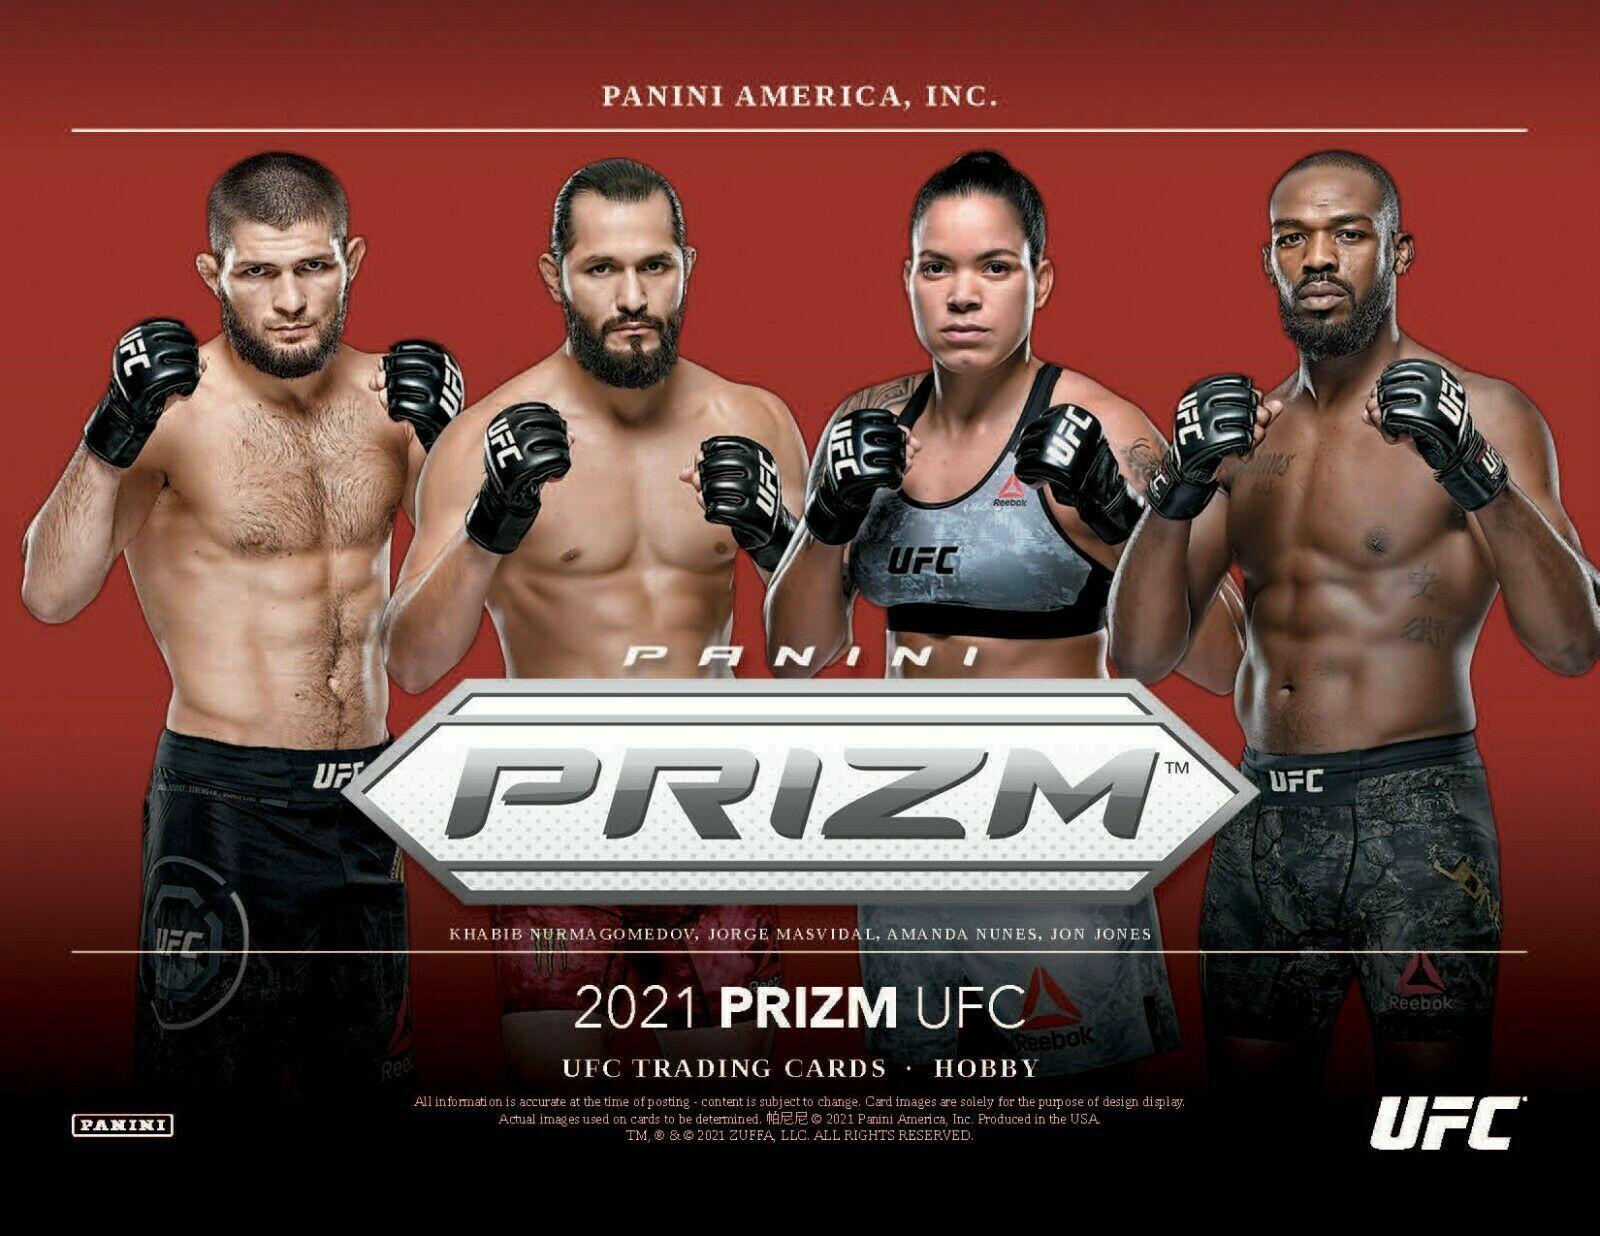 MARLON MORAES 2021 PANINI PRIZM UFC 1/3 CASE 4 BOX FIGHTER BREAK 2 - $14.99